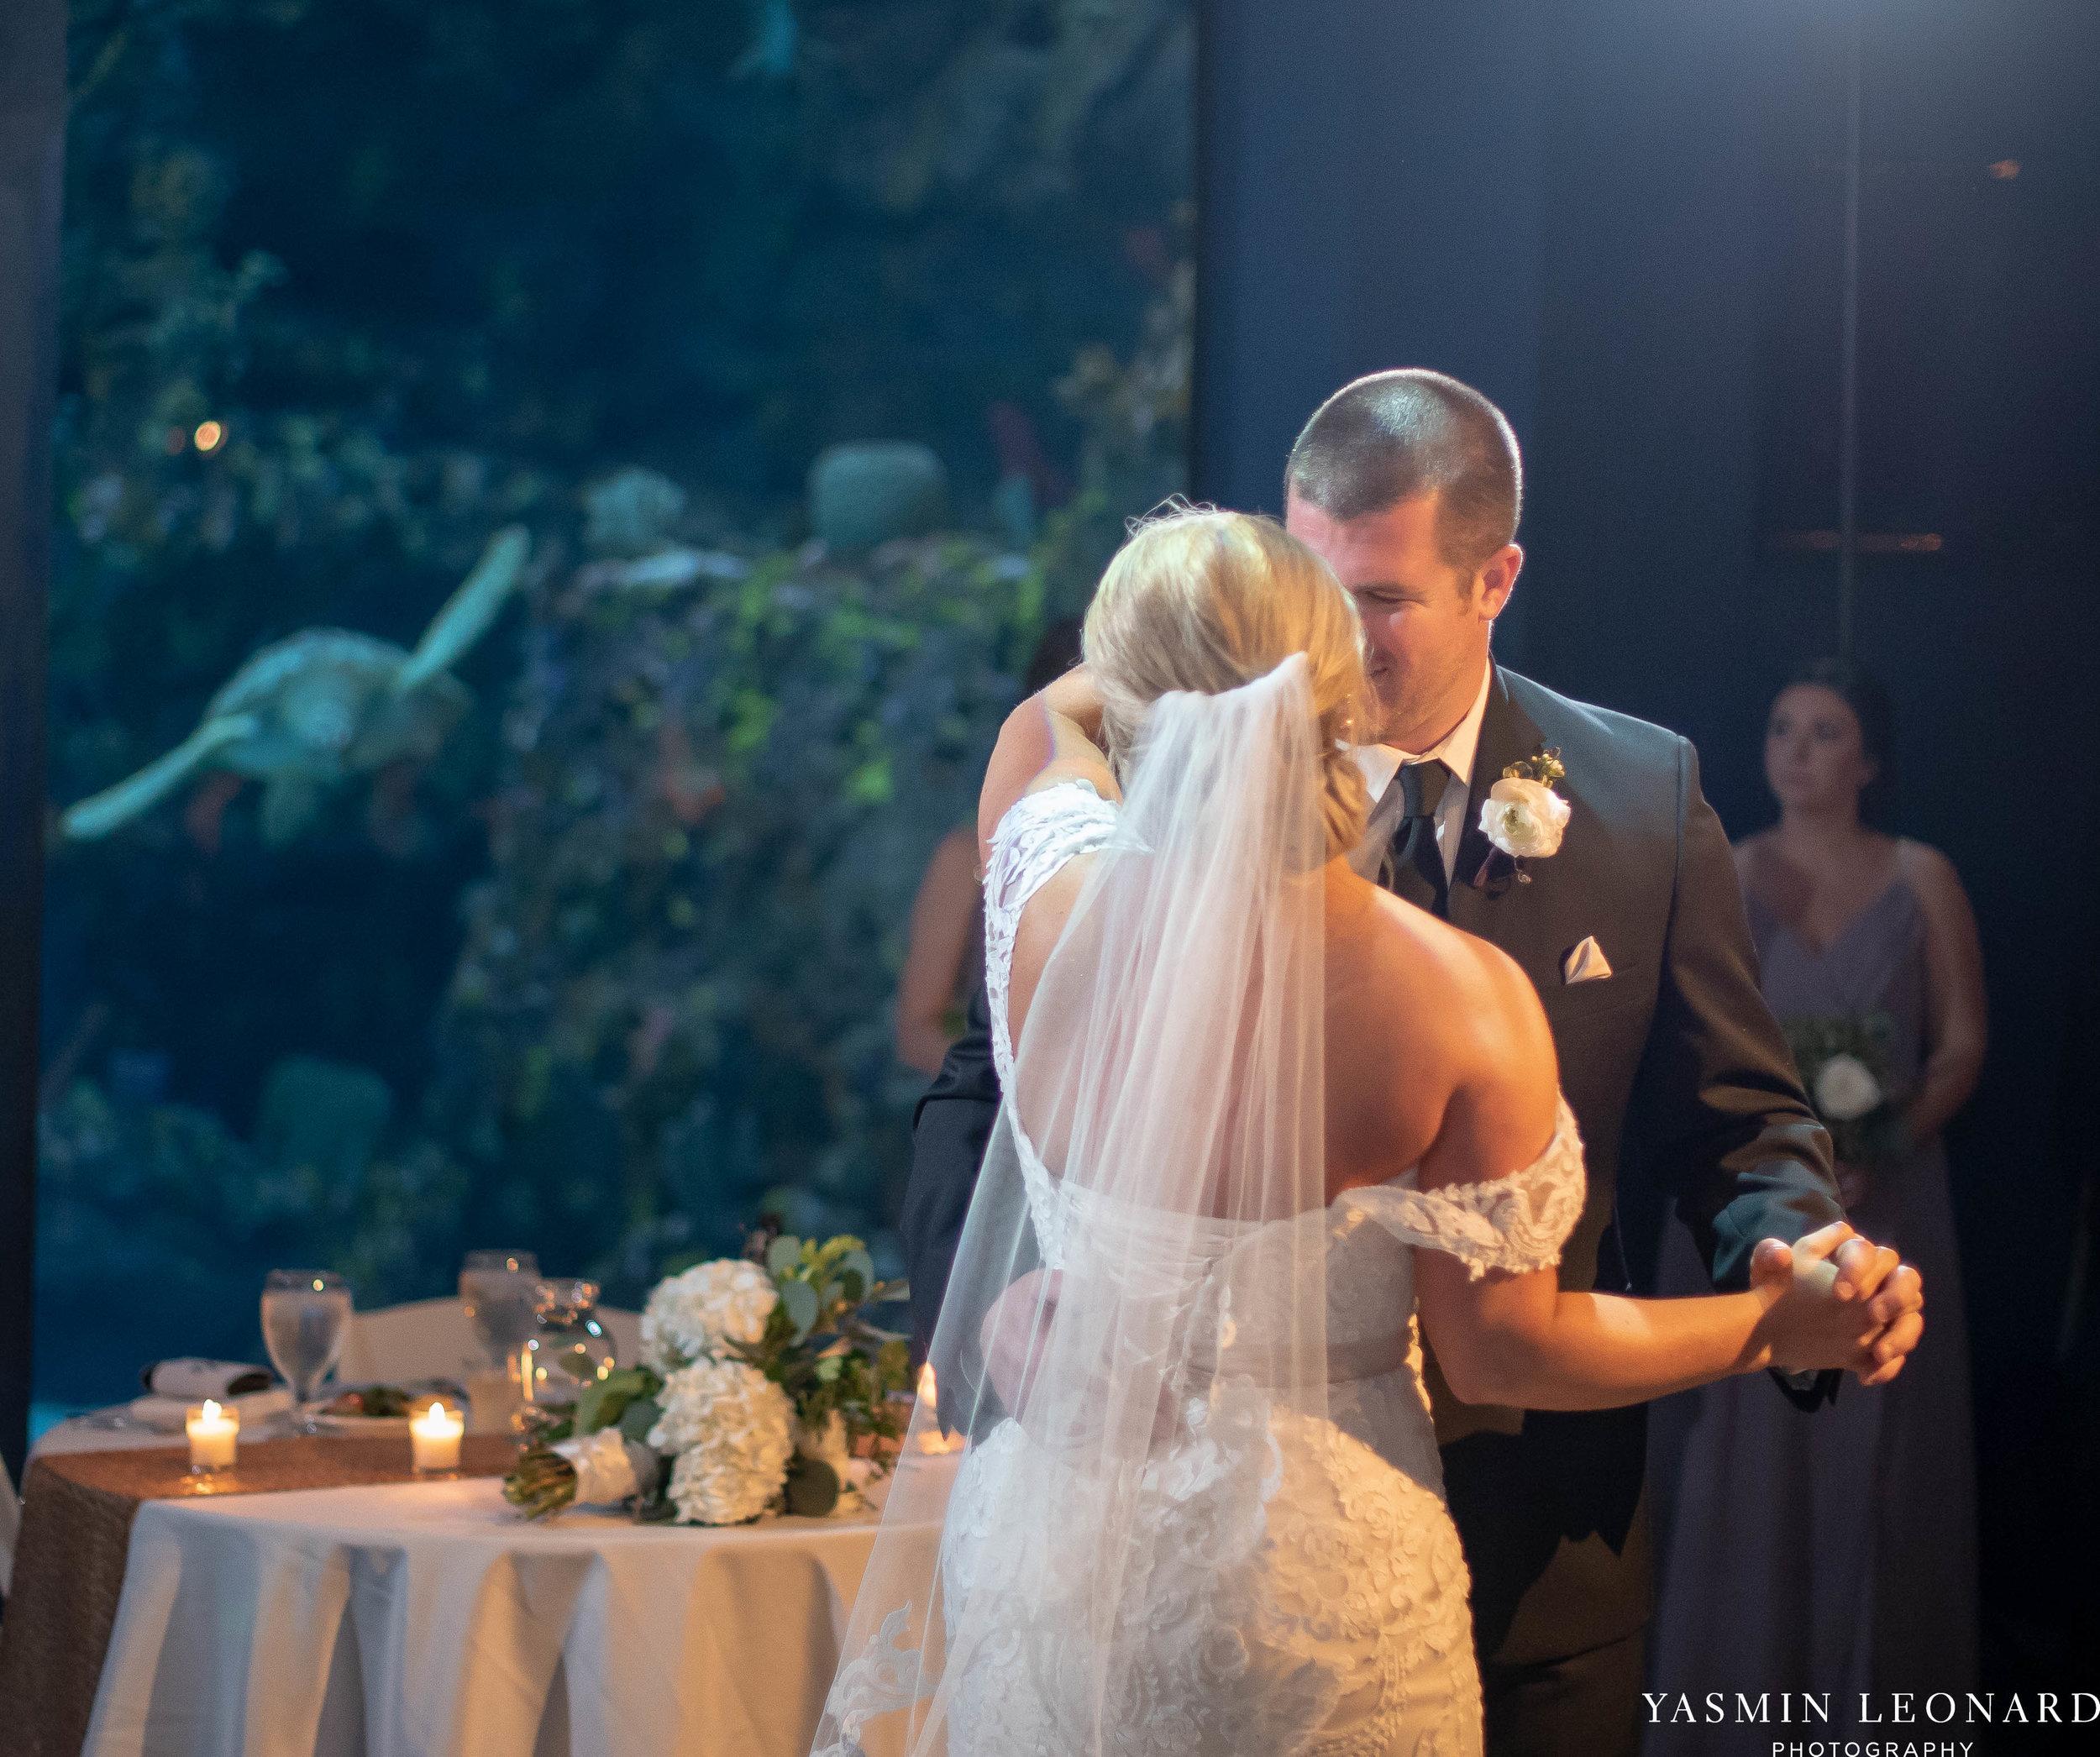 Carolina Beach Wedding - Fort Fisher Wedding - NC Acquarium - Beach Wedding - NC Wedding - Beach Wedding Inspiration - Beach Bride-43.jpg